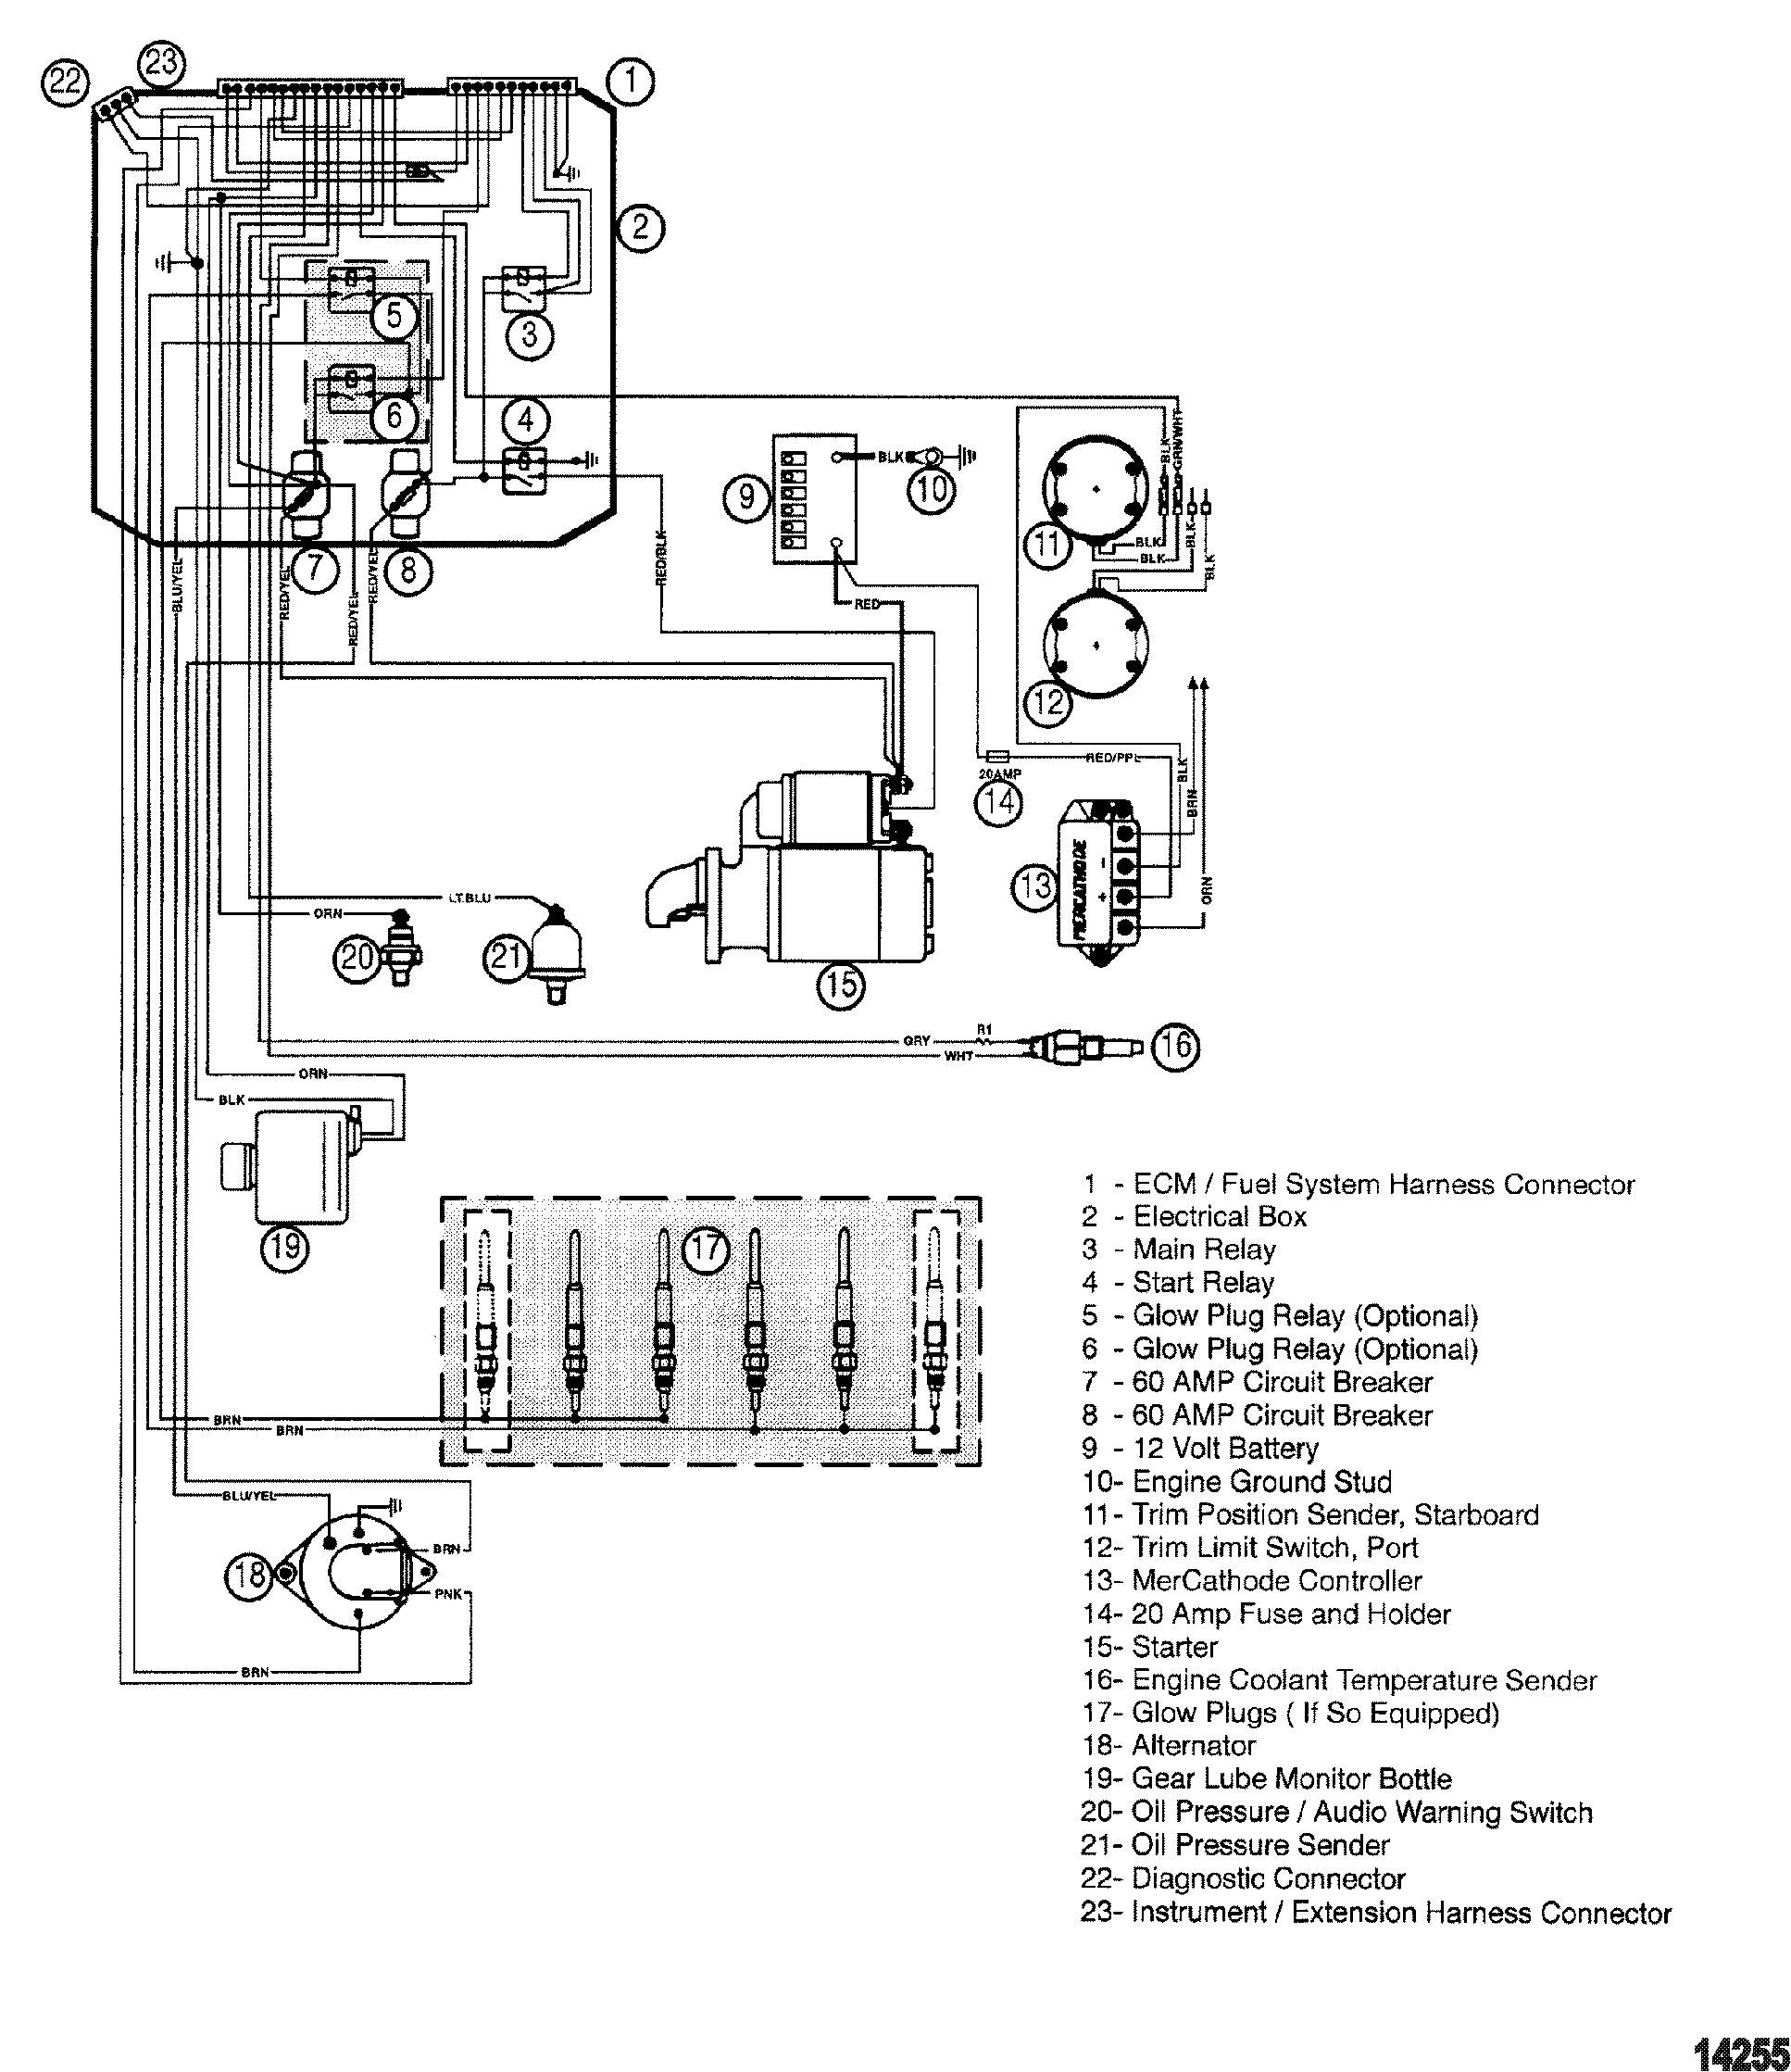 Engine Harness For Mercruiser Mie Cummins Mercruser Diesel 28l Jd 165 Wiring Diagram 42l 250